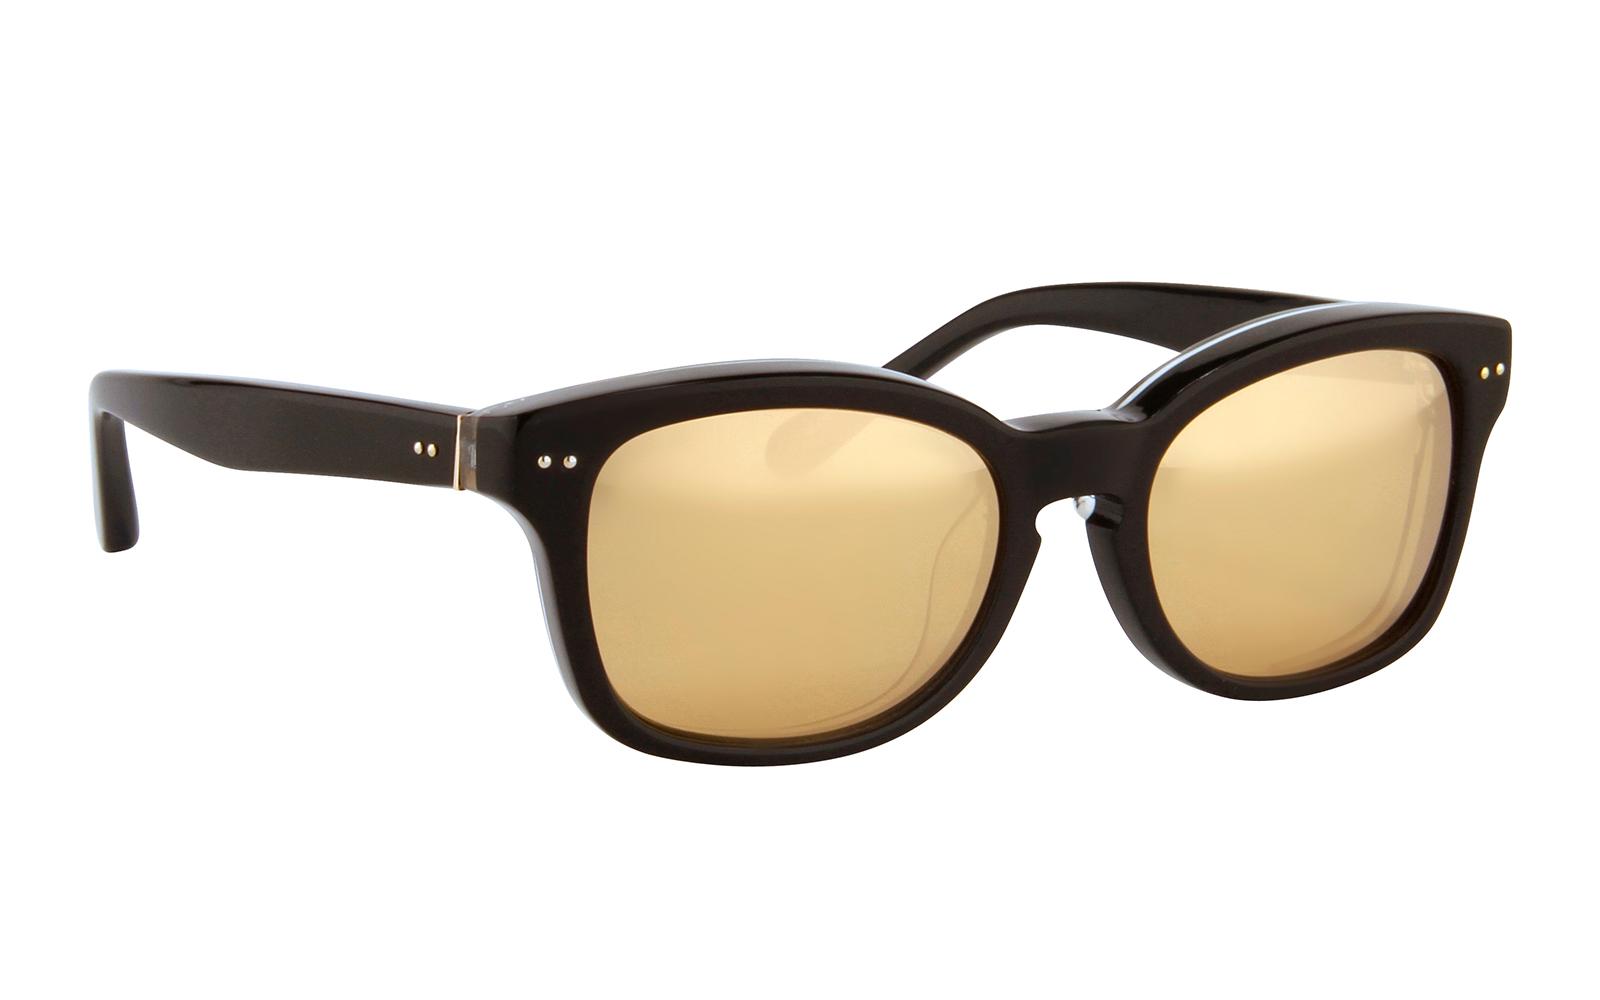 2014 trend report: mirrored sunglasses